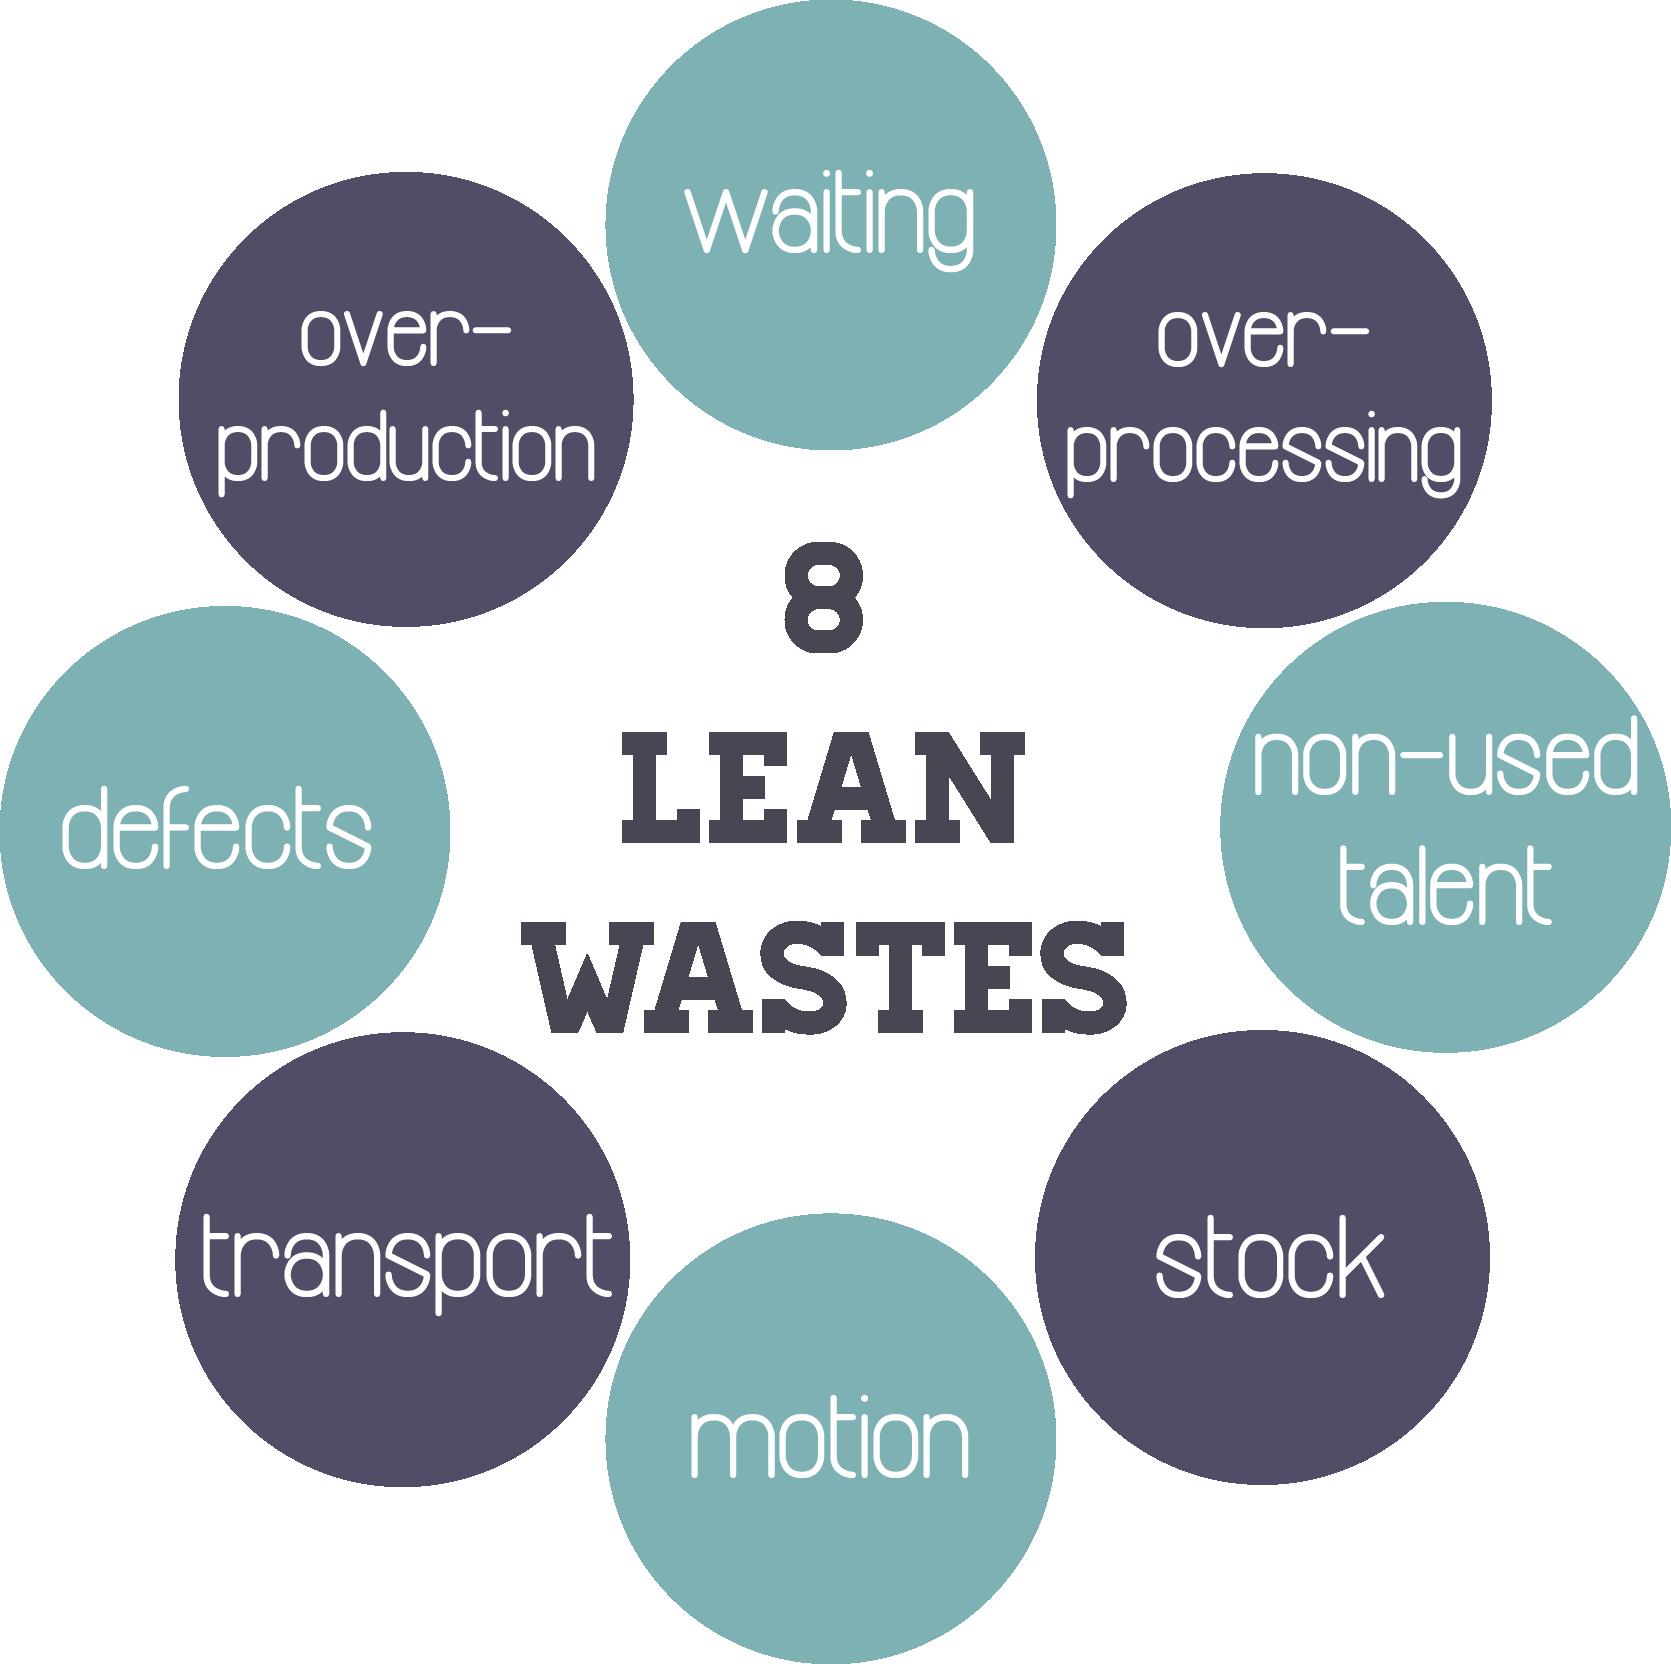 Lean Secrets: 6 Simple Steps That Cut Business Costs | Udemy